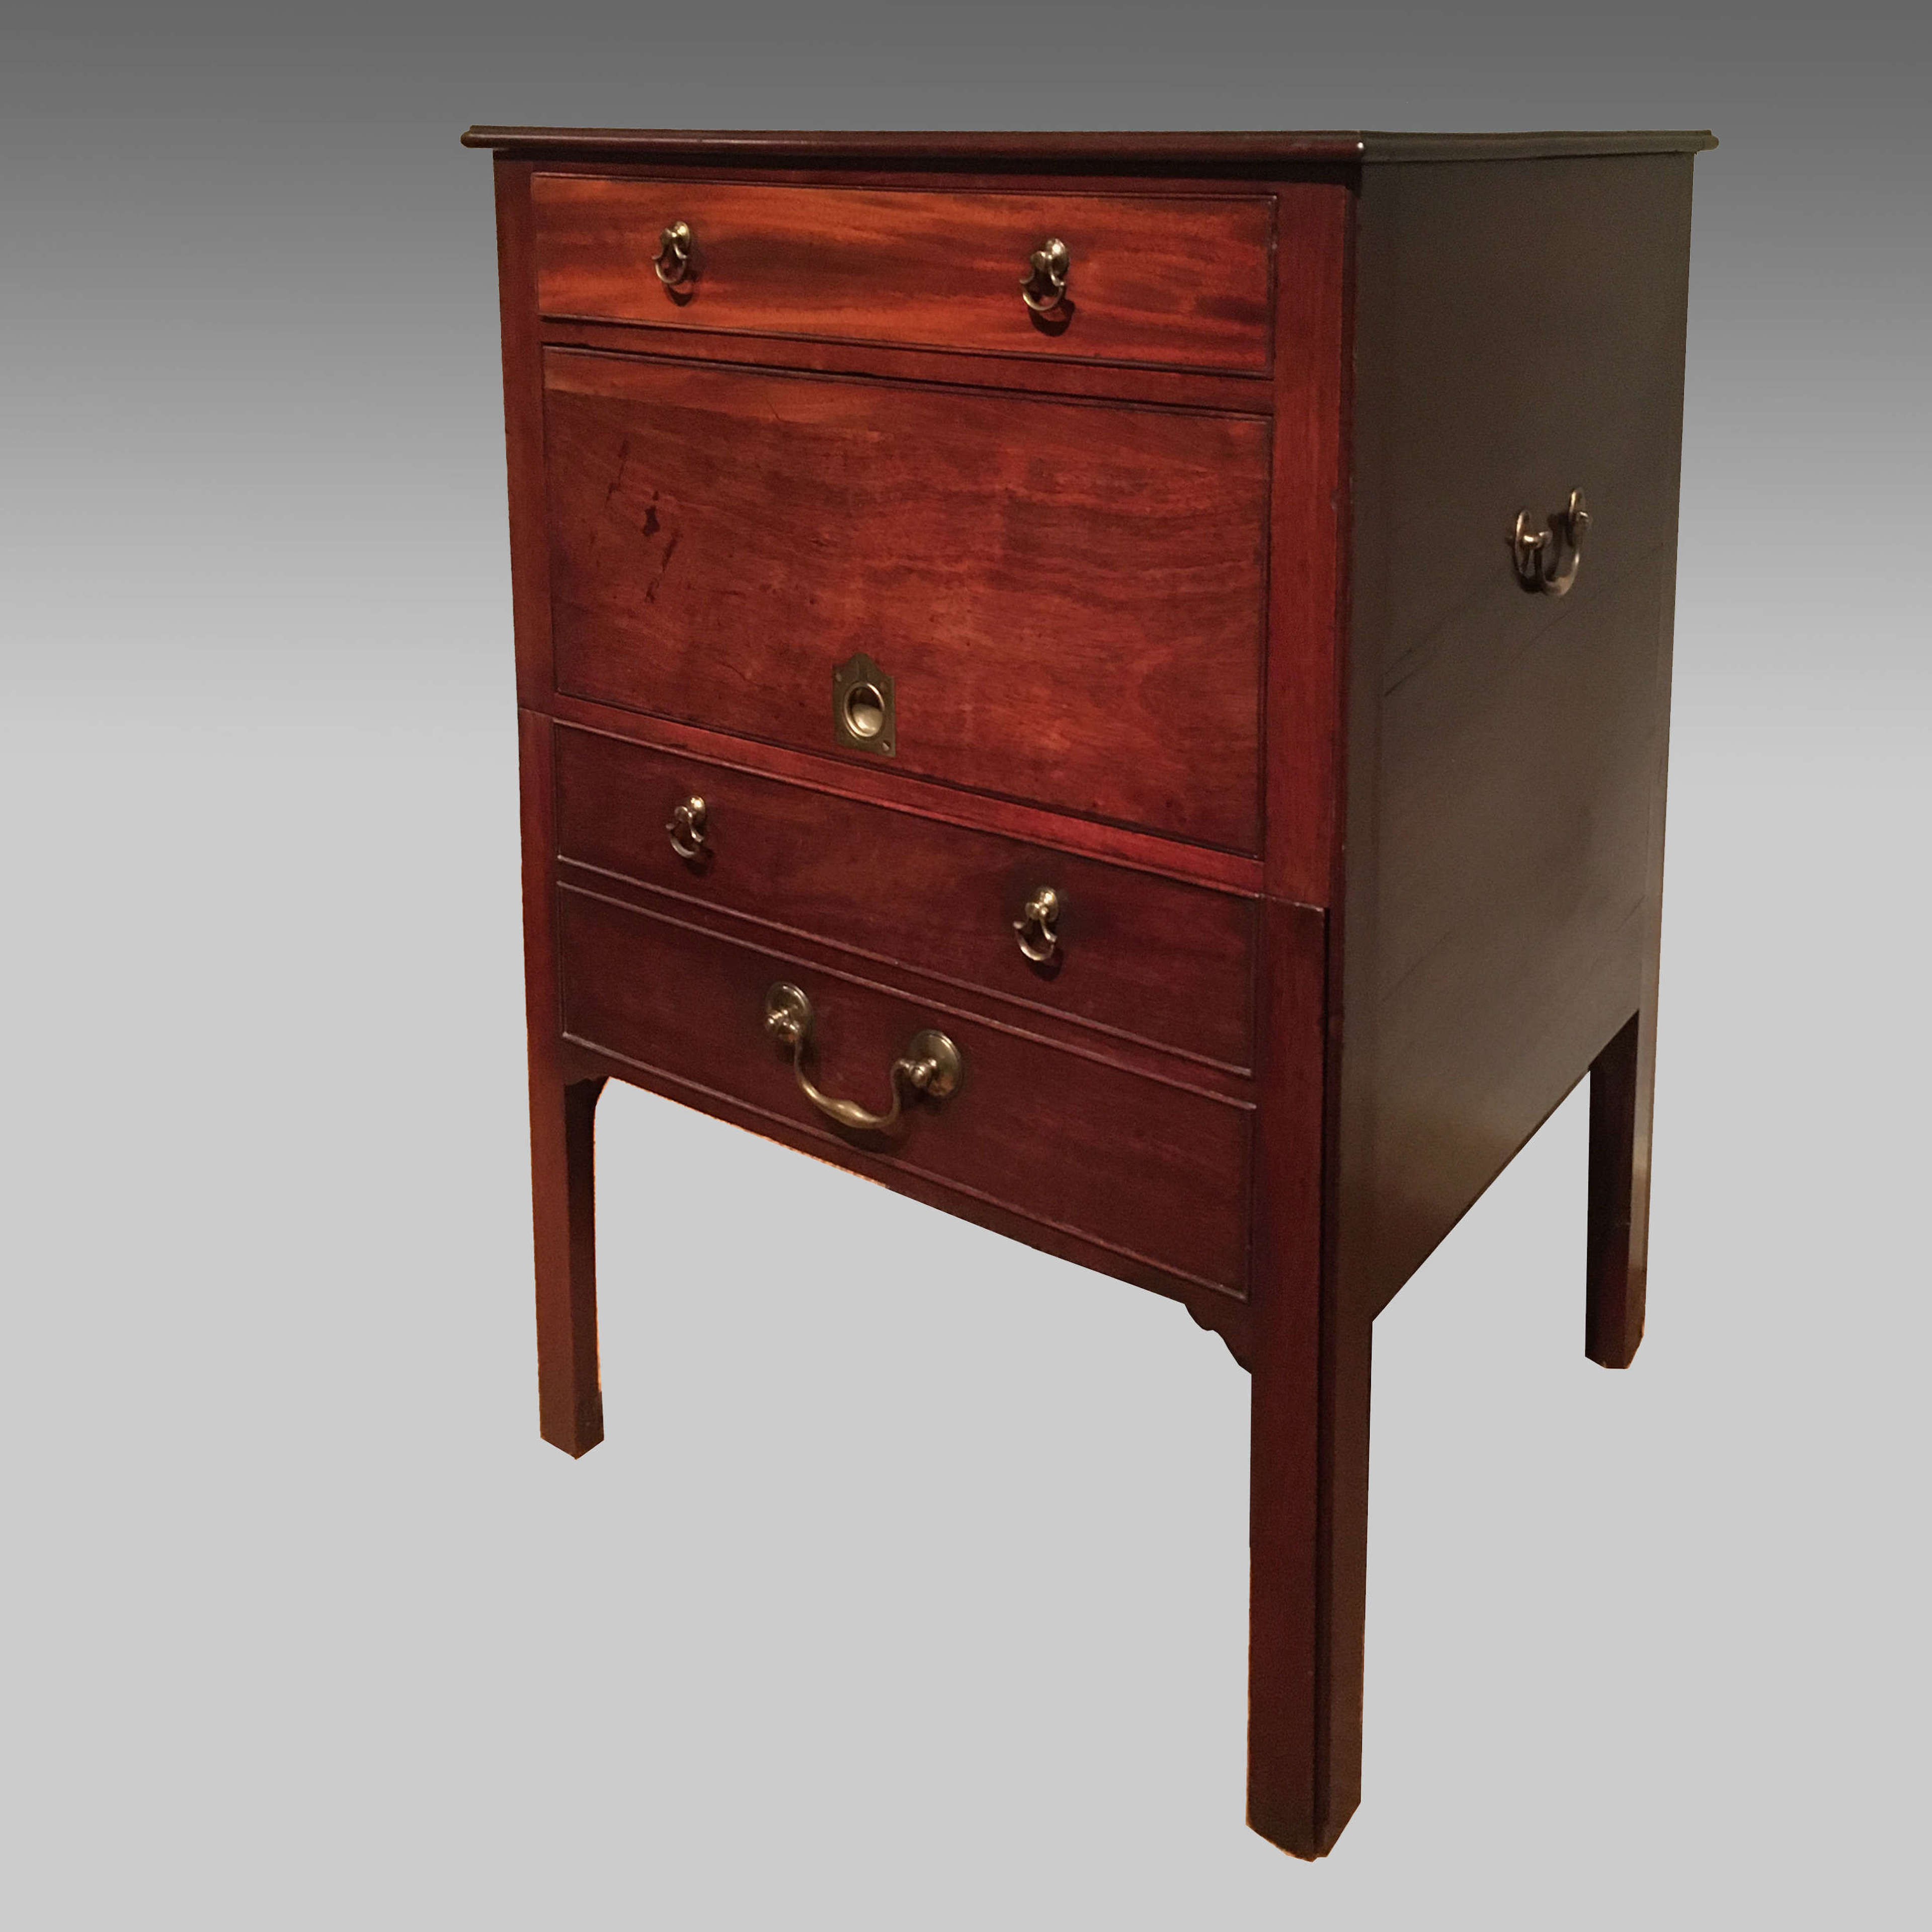 George 111 mahogany bedside cabinet